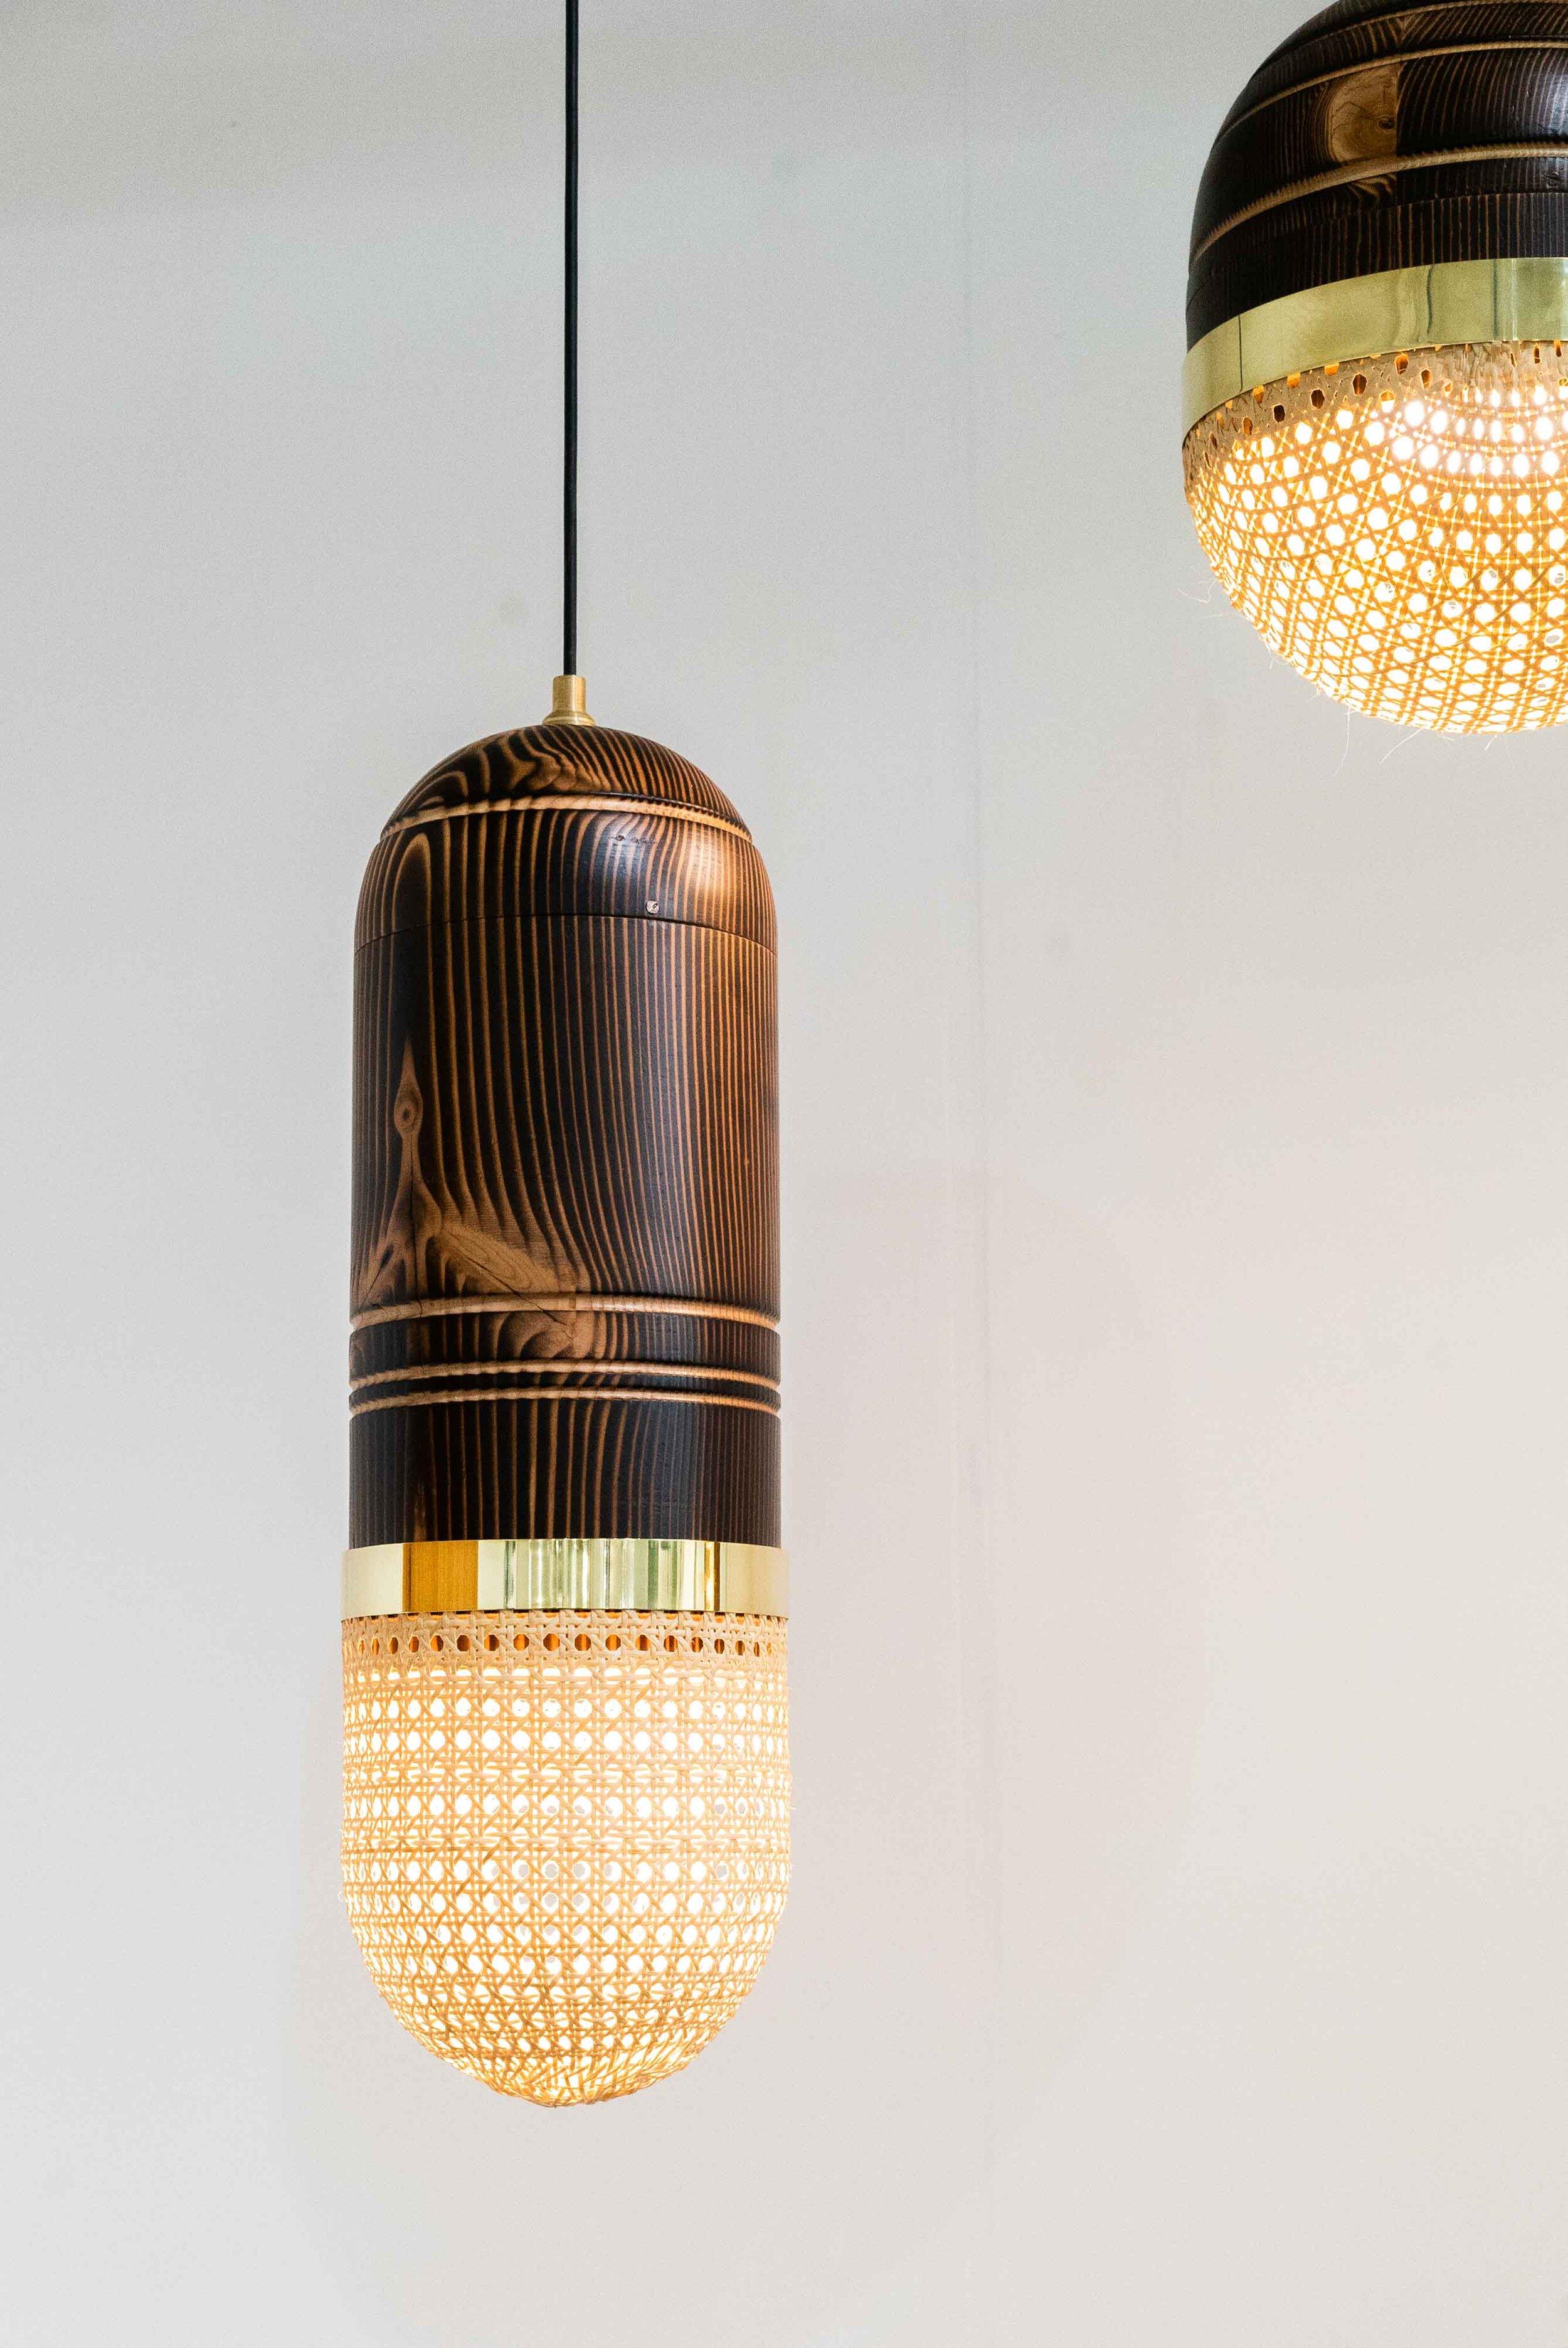 Lamps by Carolina Palombo.